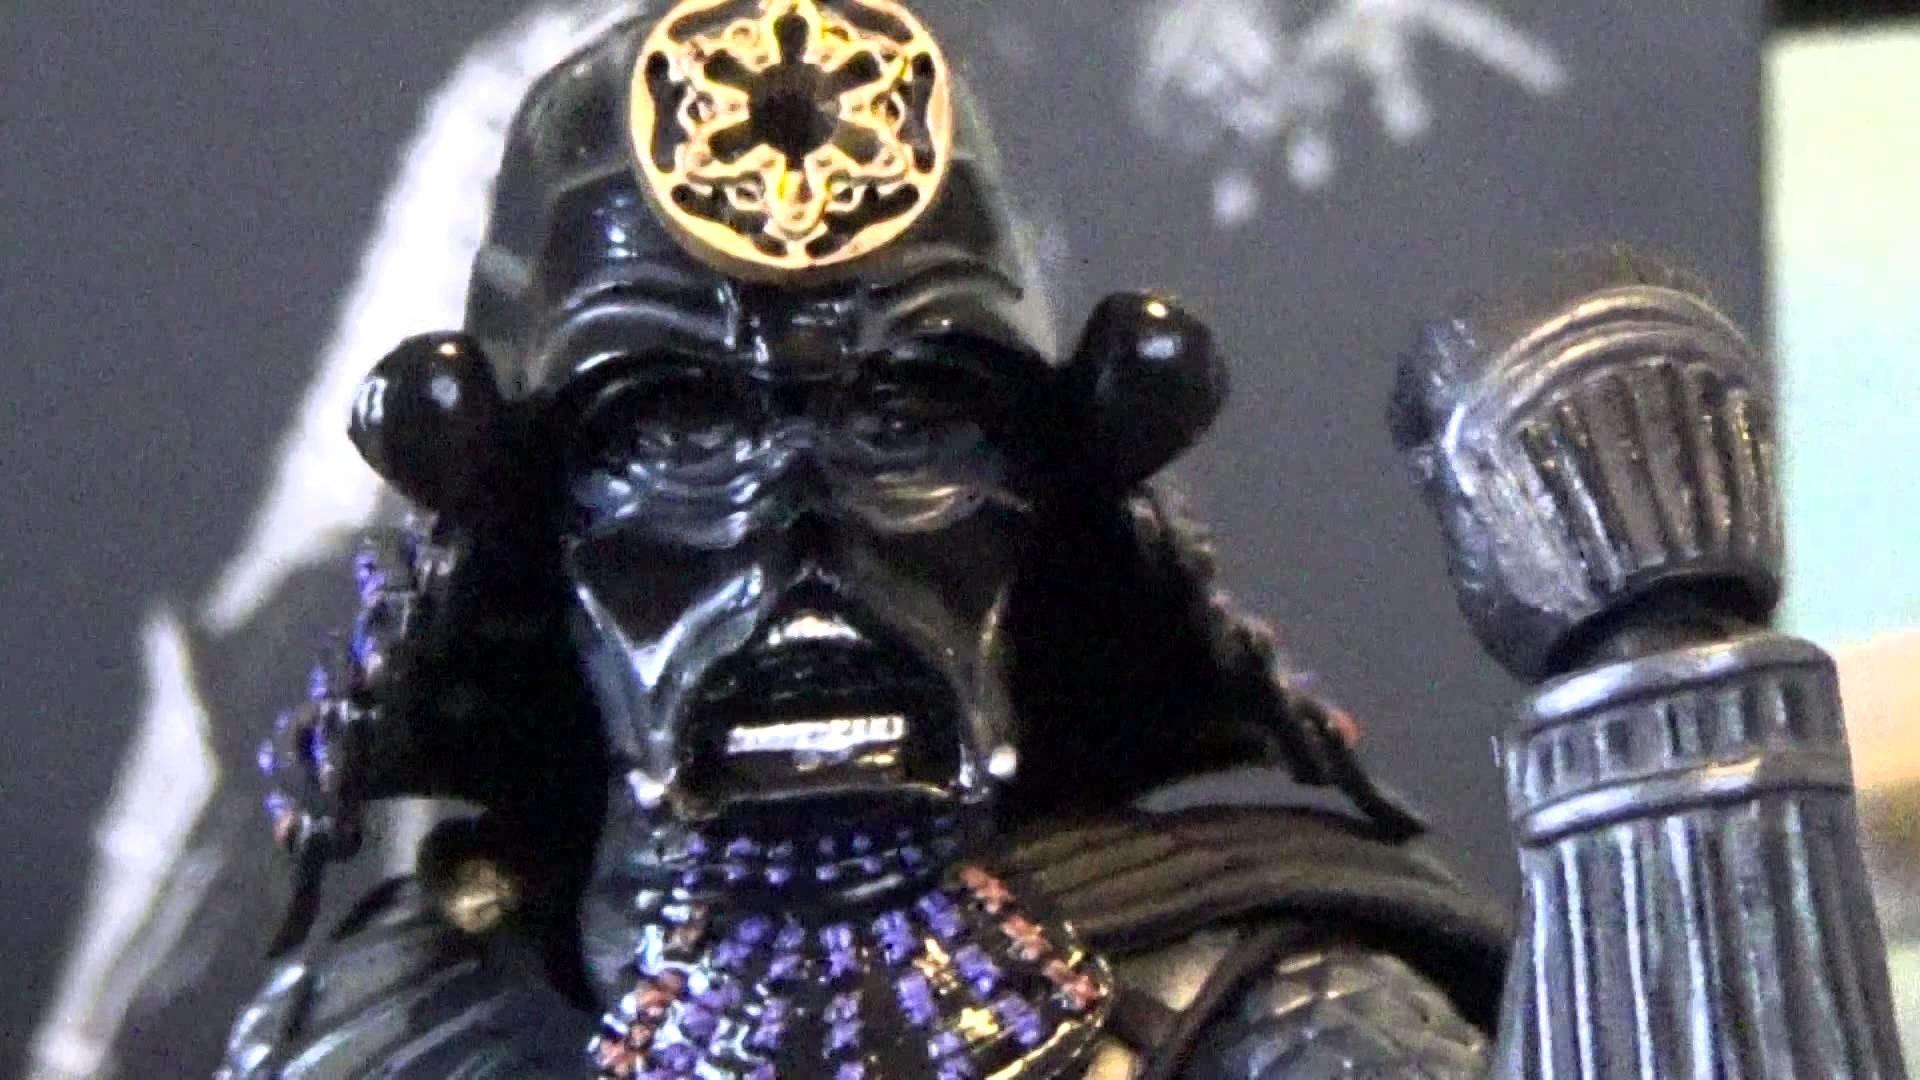 Star Wars BAN-DAI Movie Realization Samurai Taisho Darth Vader Toy Review –  YouTube